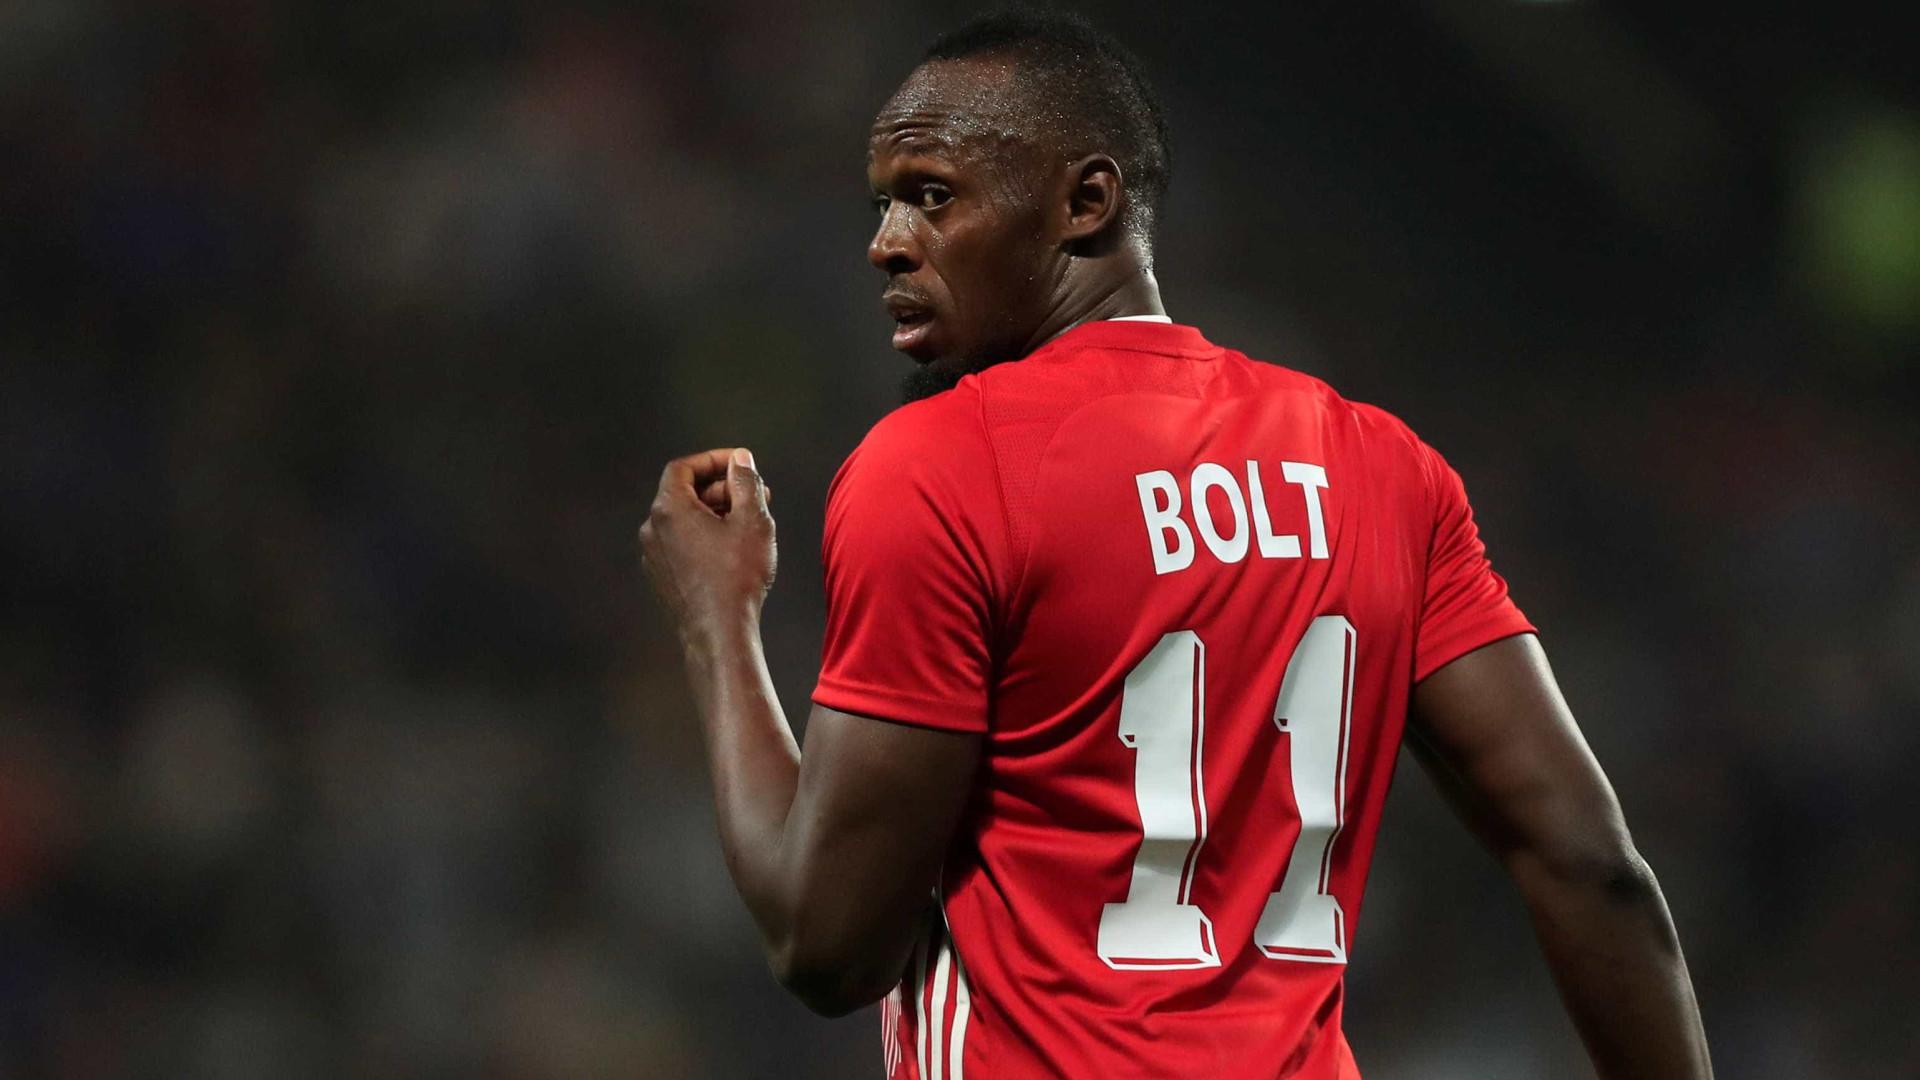 Recordista dos 100 m, Bolt tem proposta para defender clube de Malta